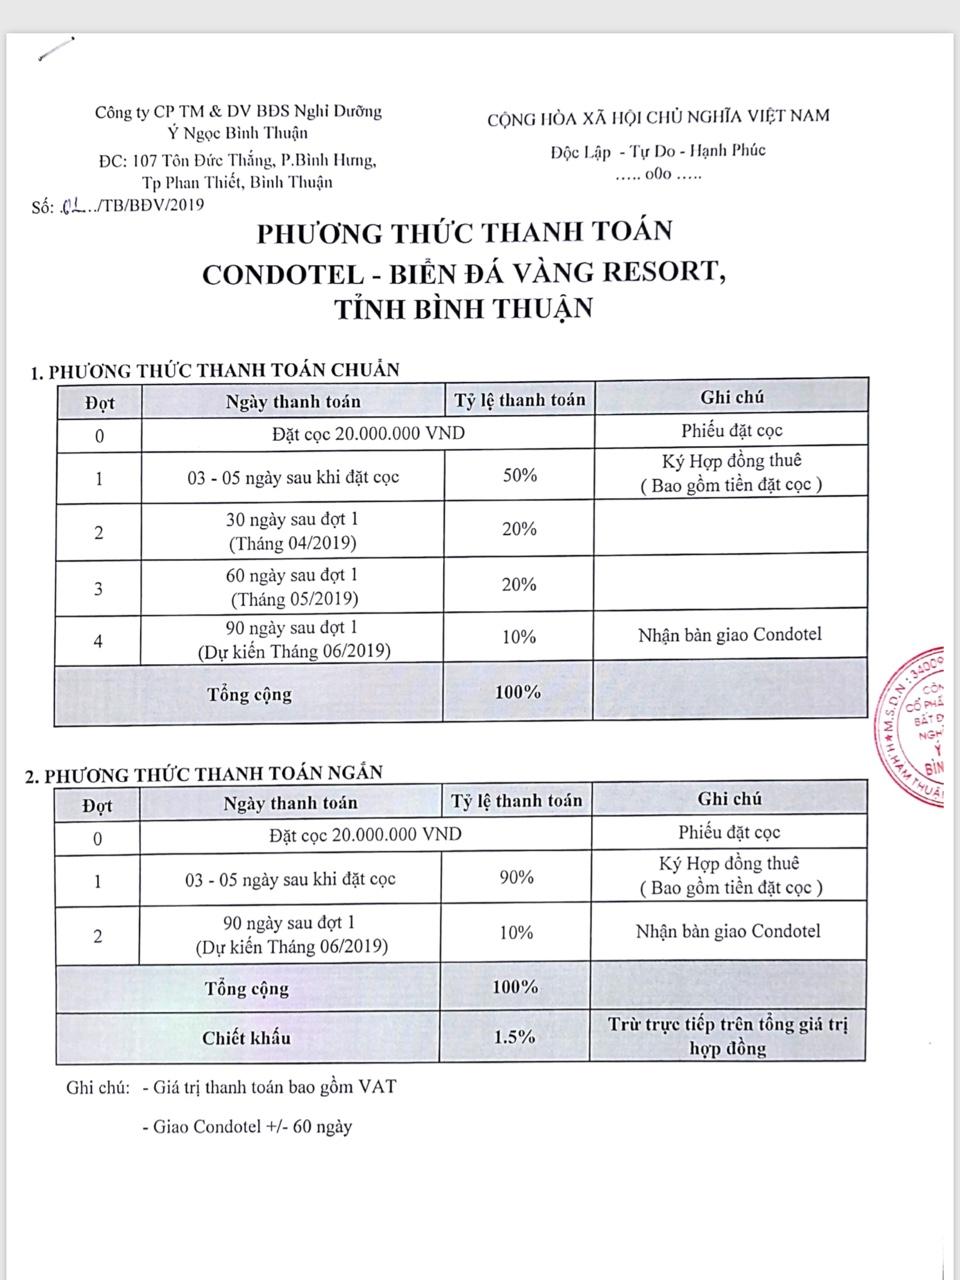 Phuong-Thuc-Thanh-Toan-Du-An-Condotel-Bien-Da-Vang